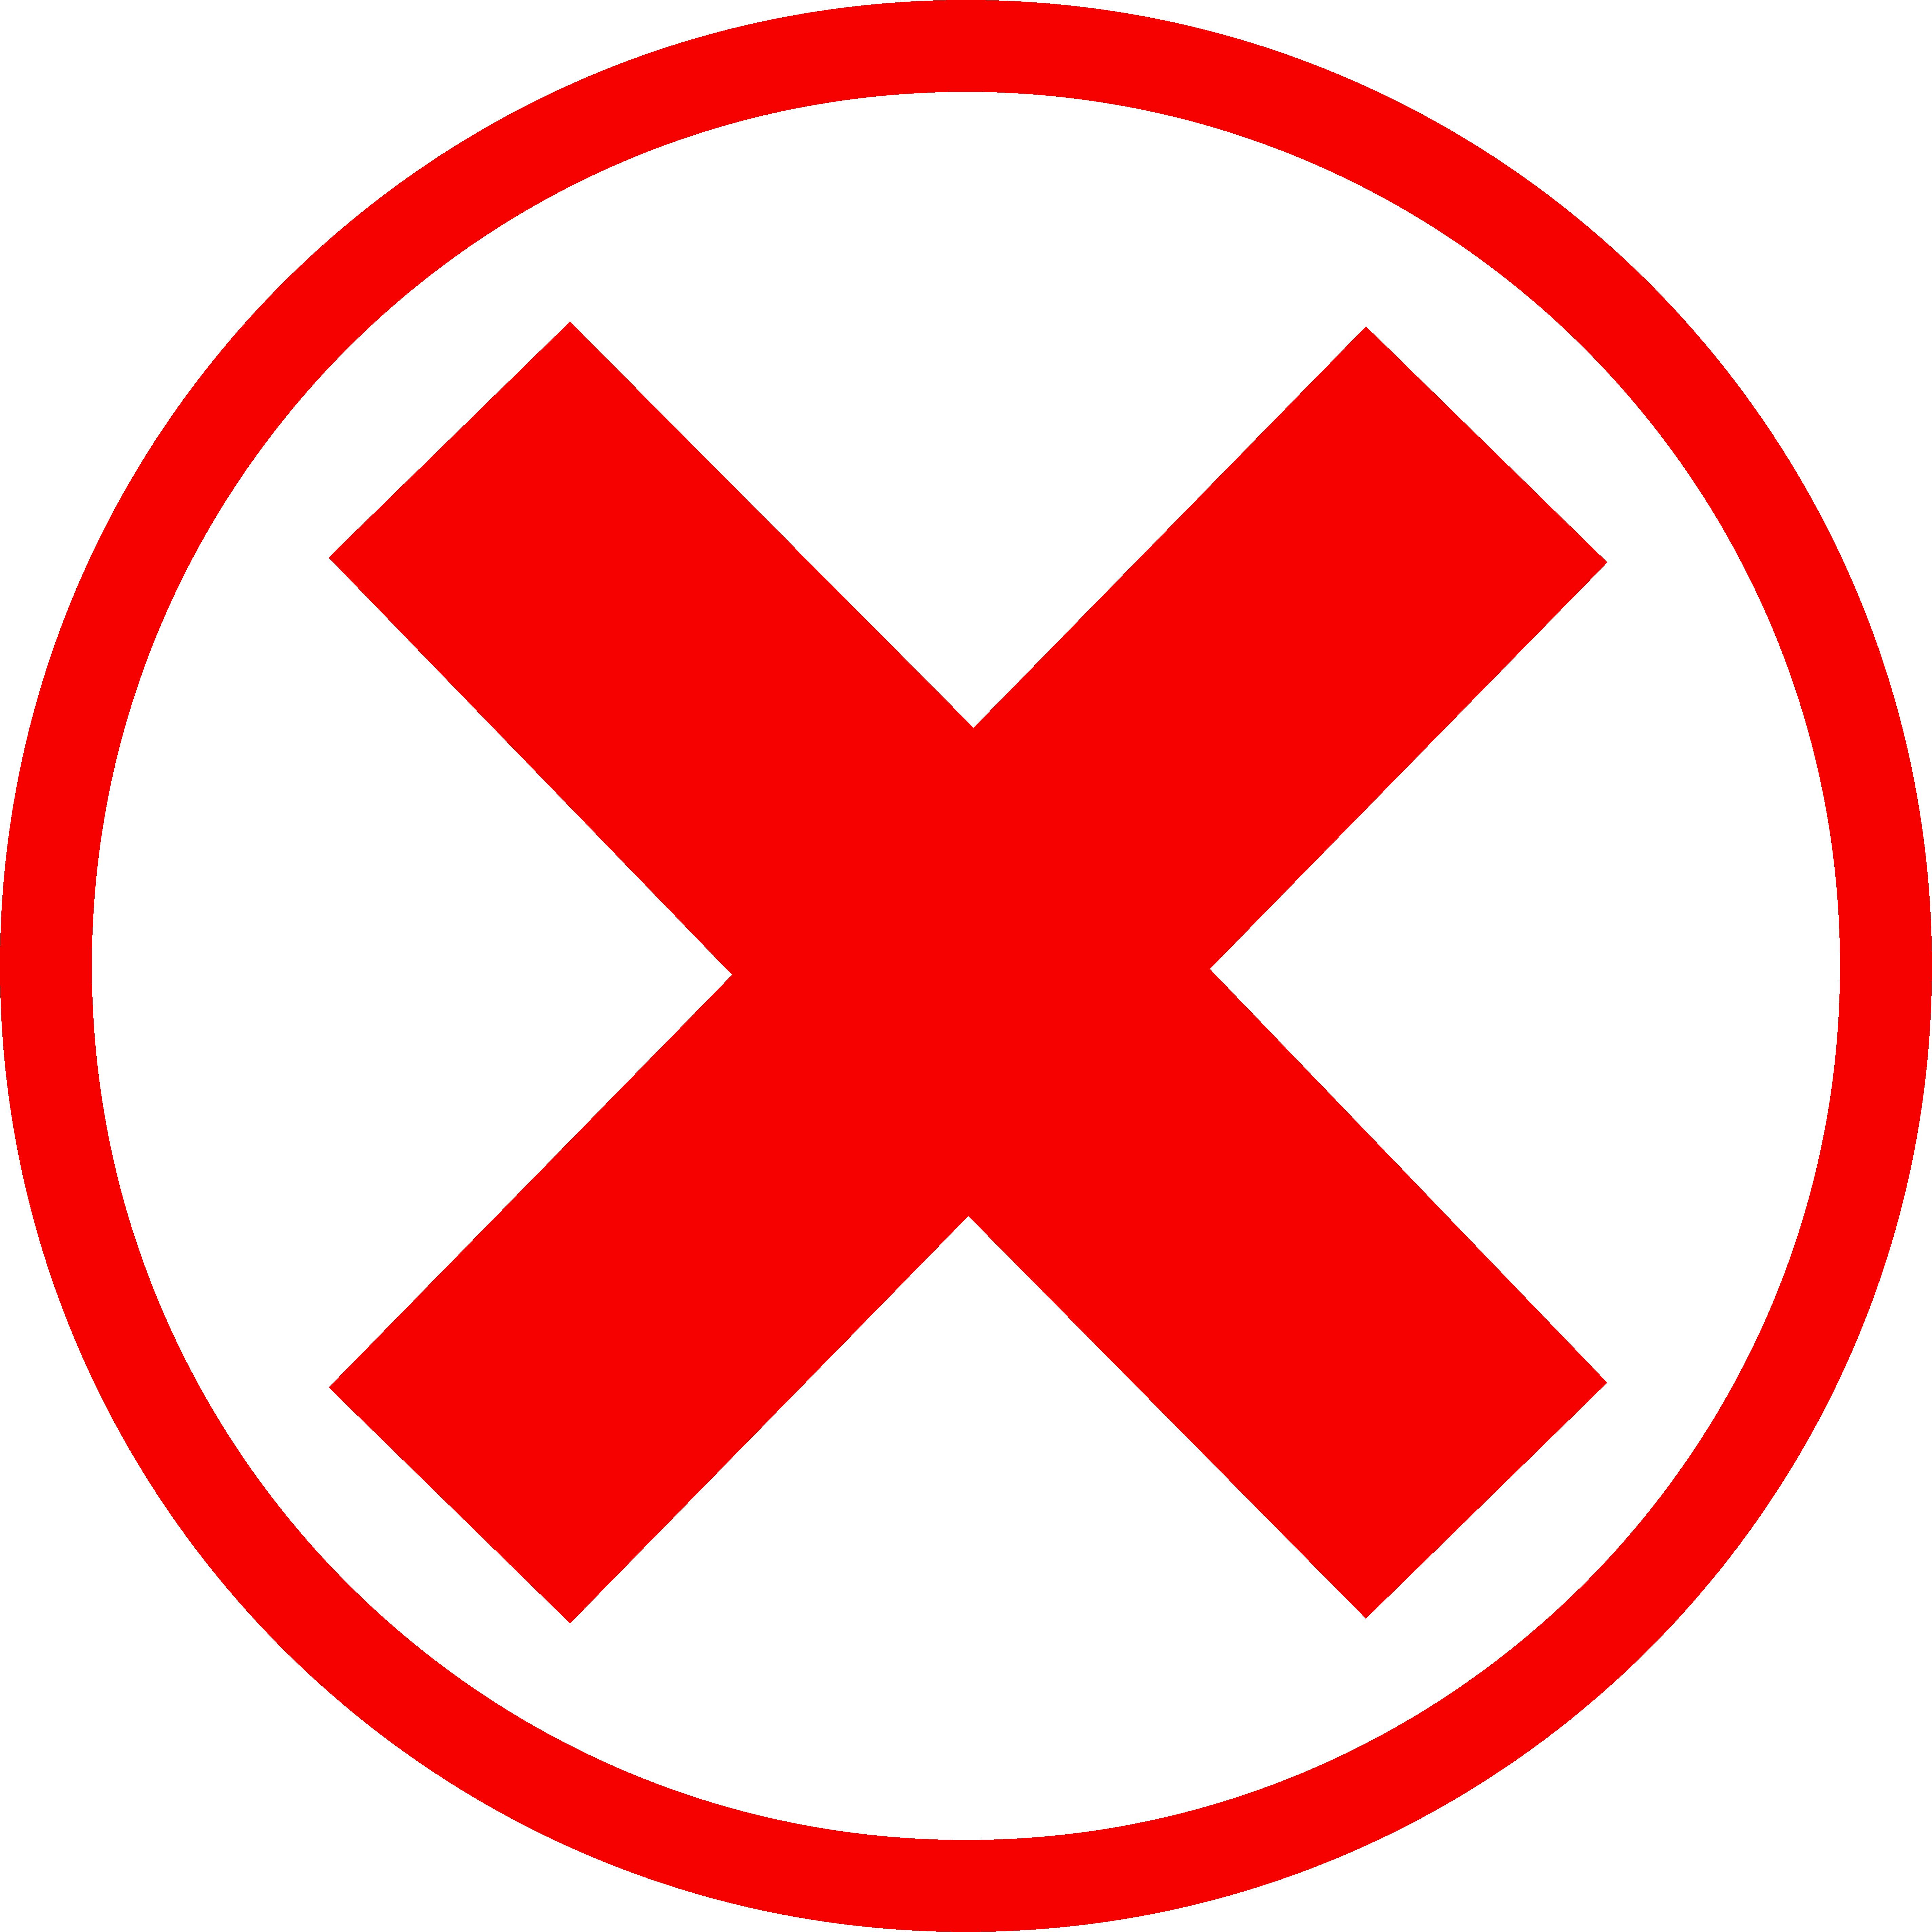 5695x5695 X Mark Red Circle Clip Art